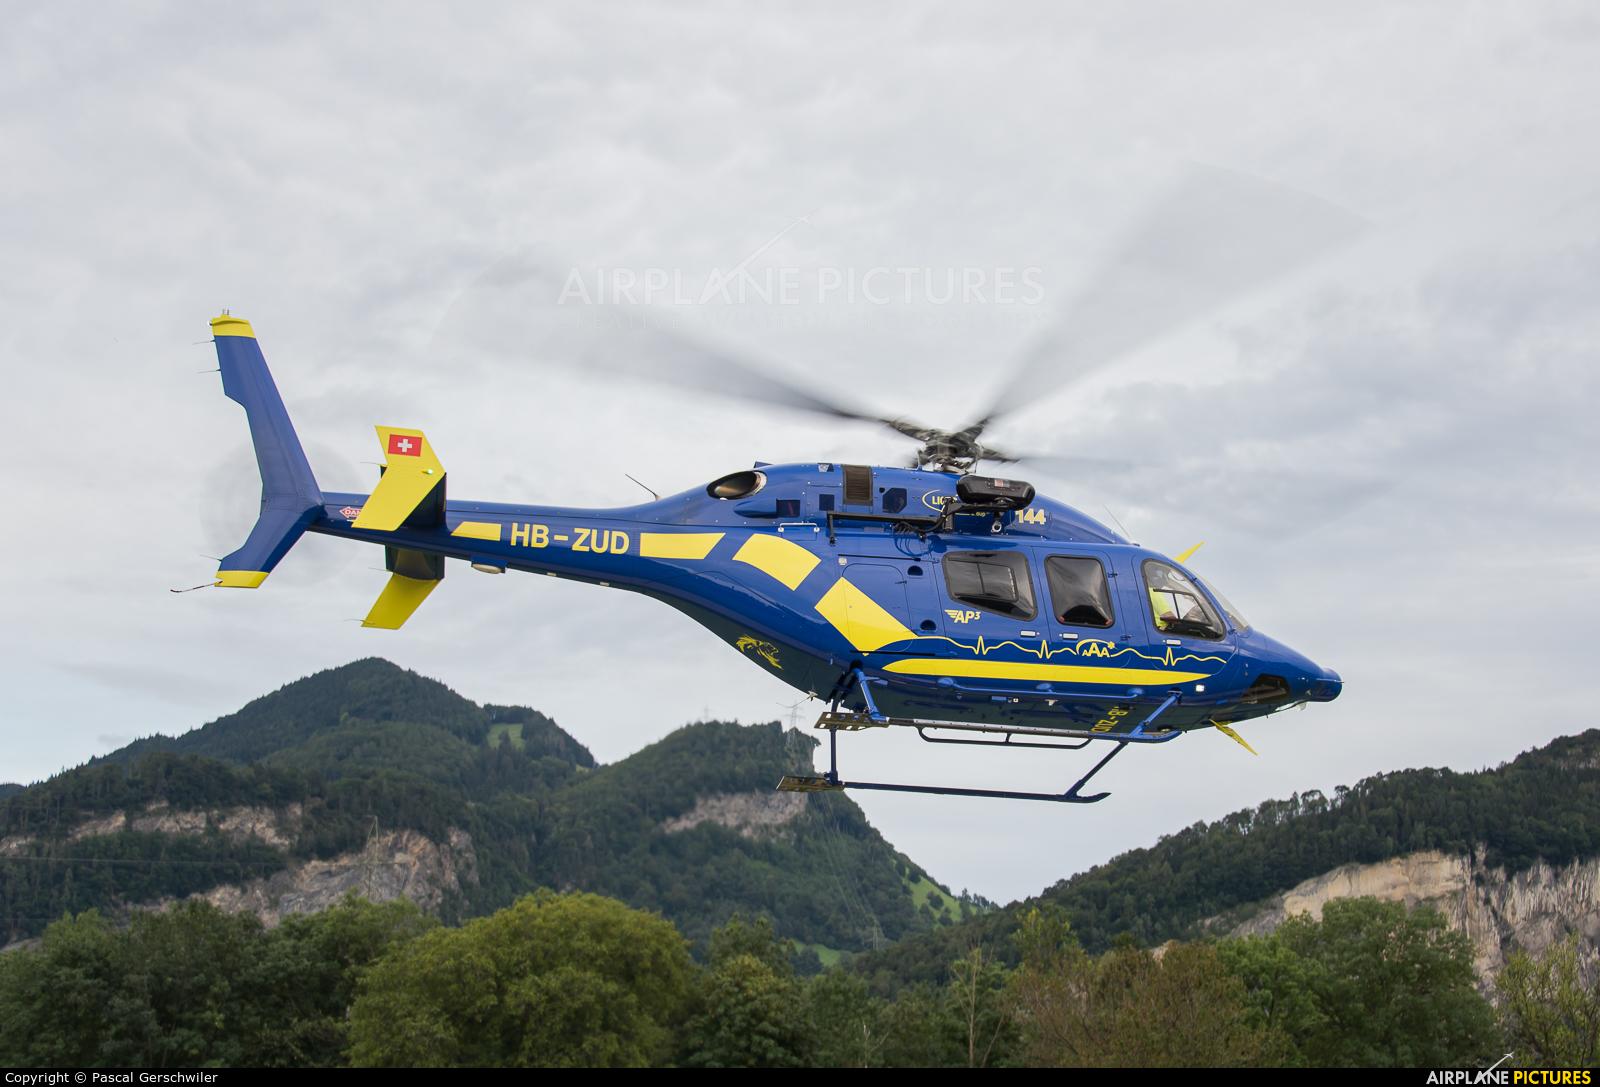 Lions Air HB-ZUD aircraft at Balzers heliport